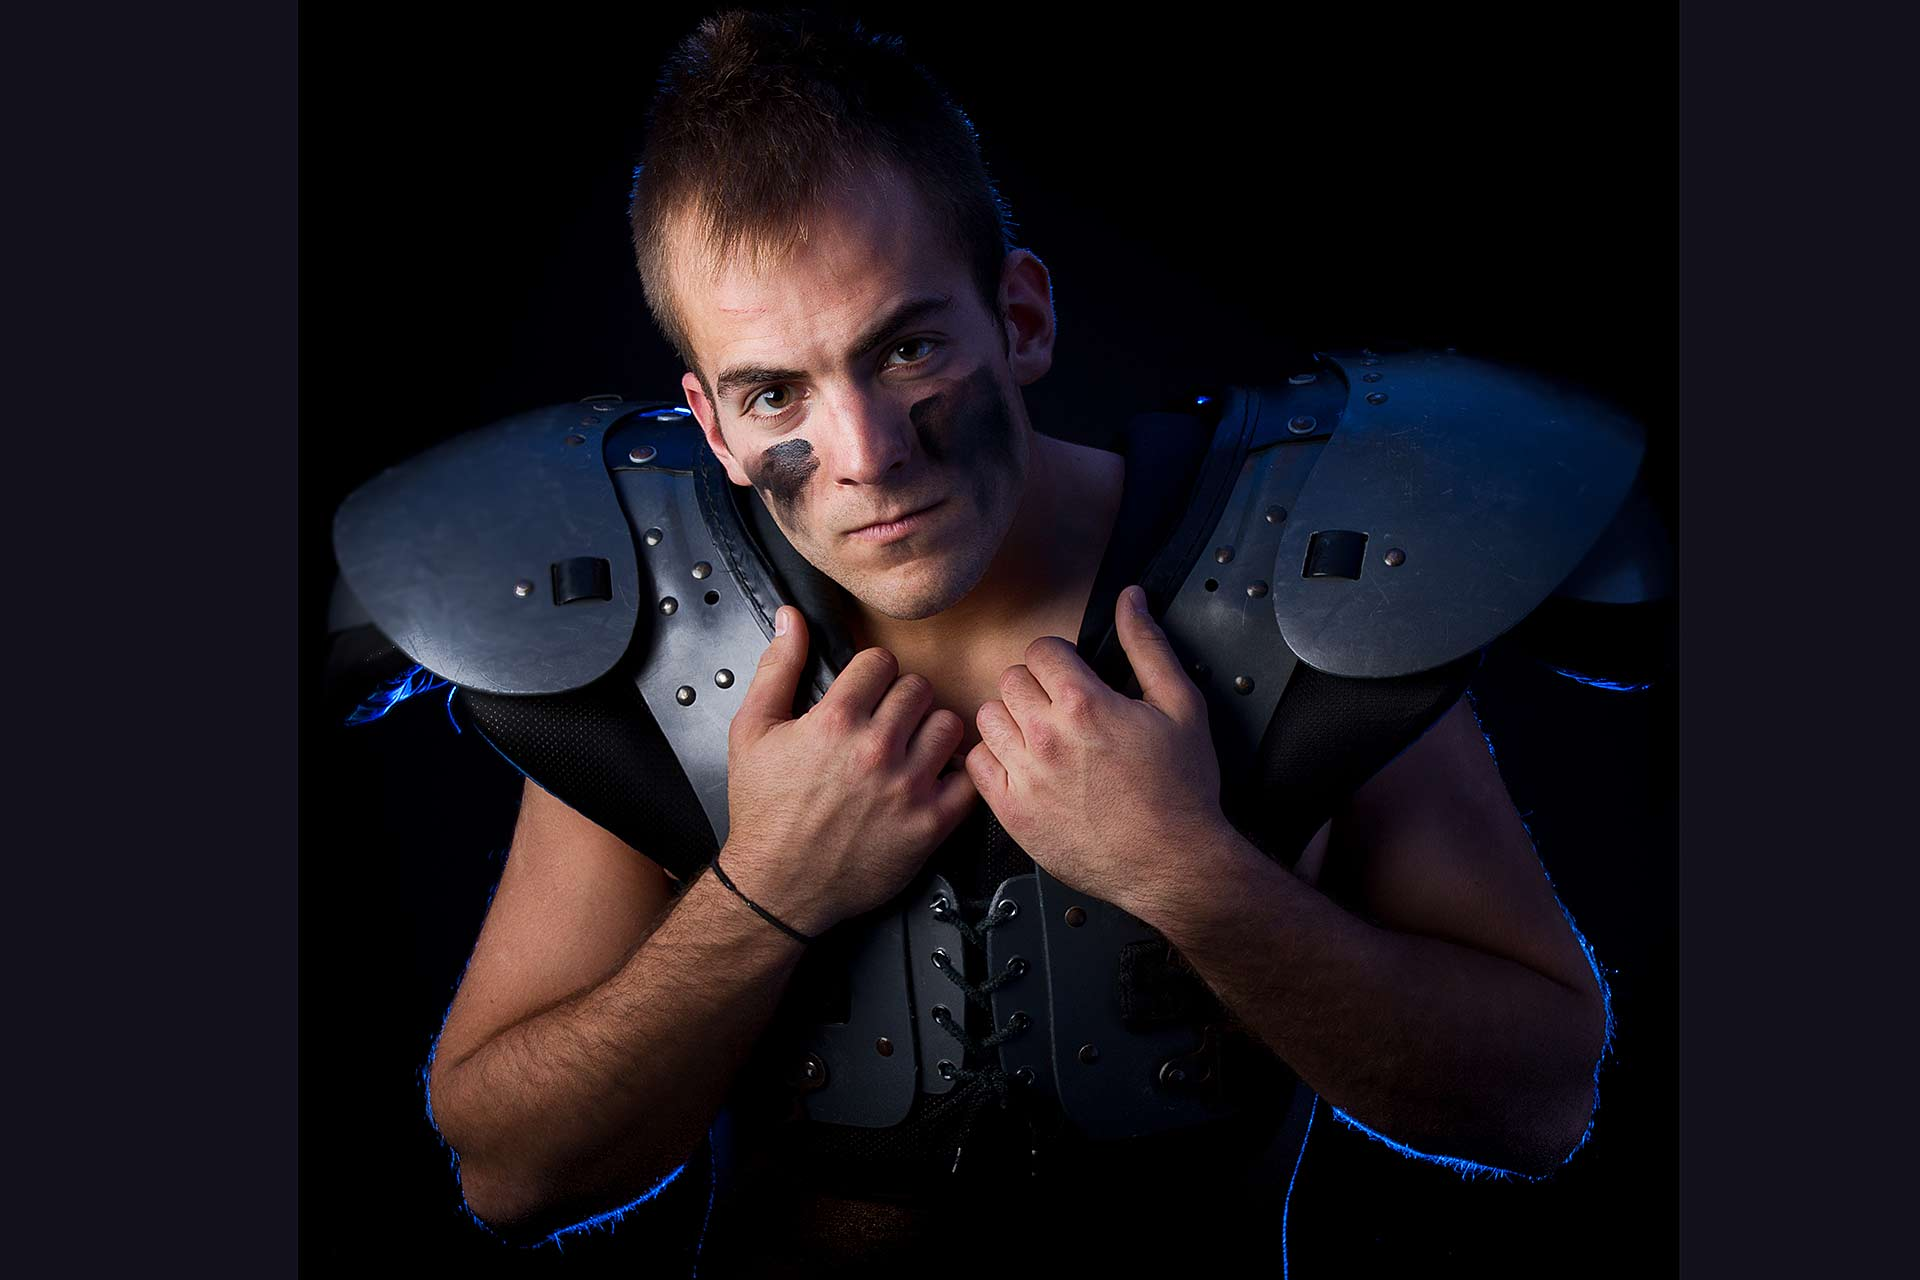 Sports Senior Photographer